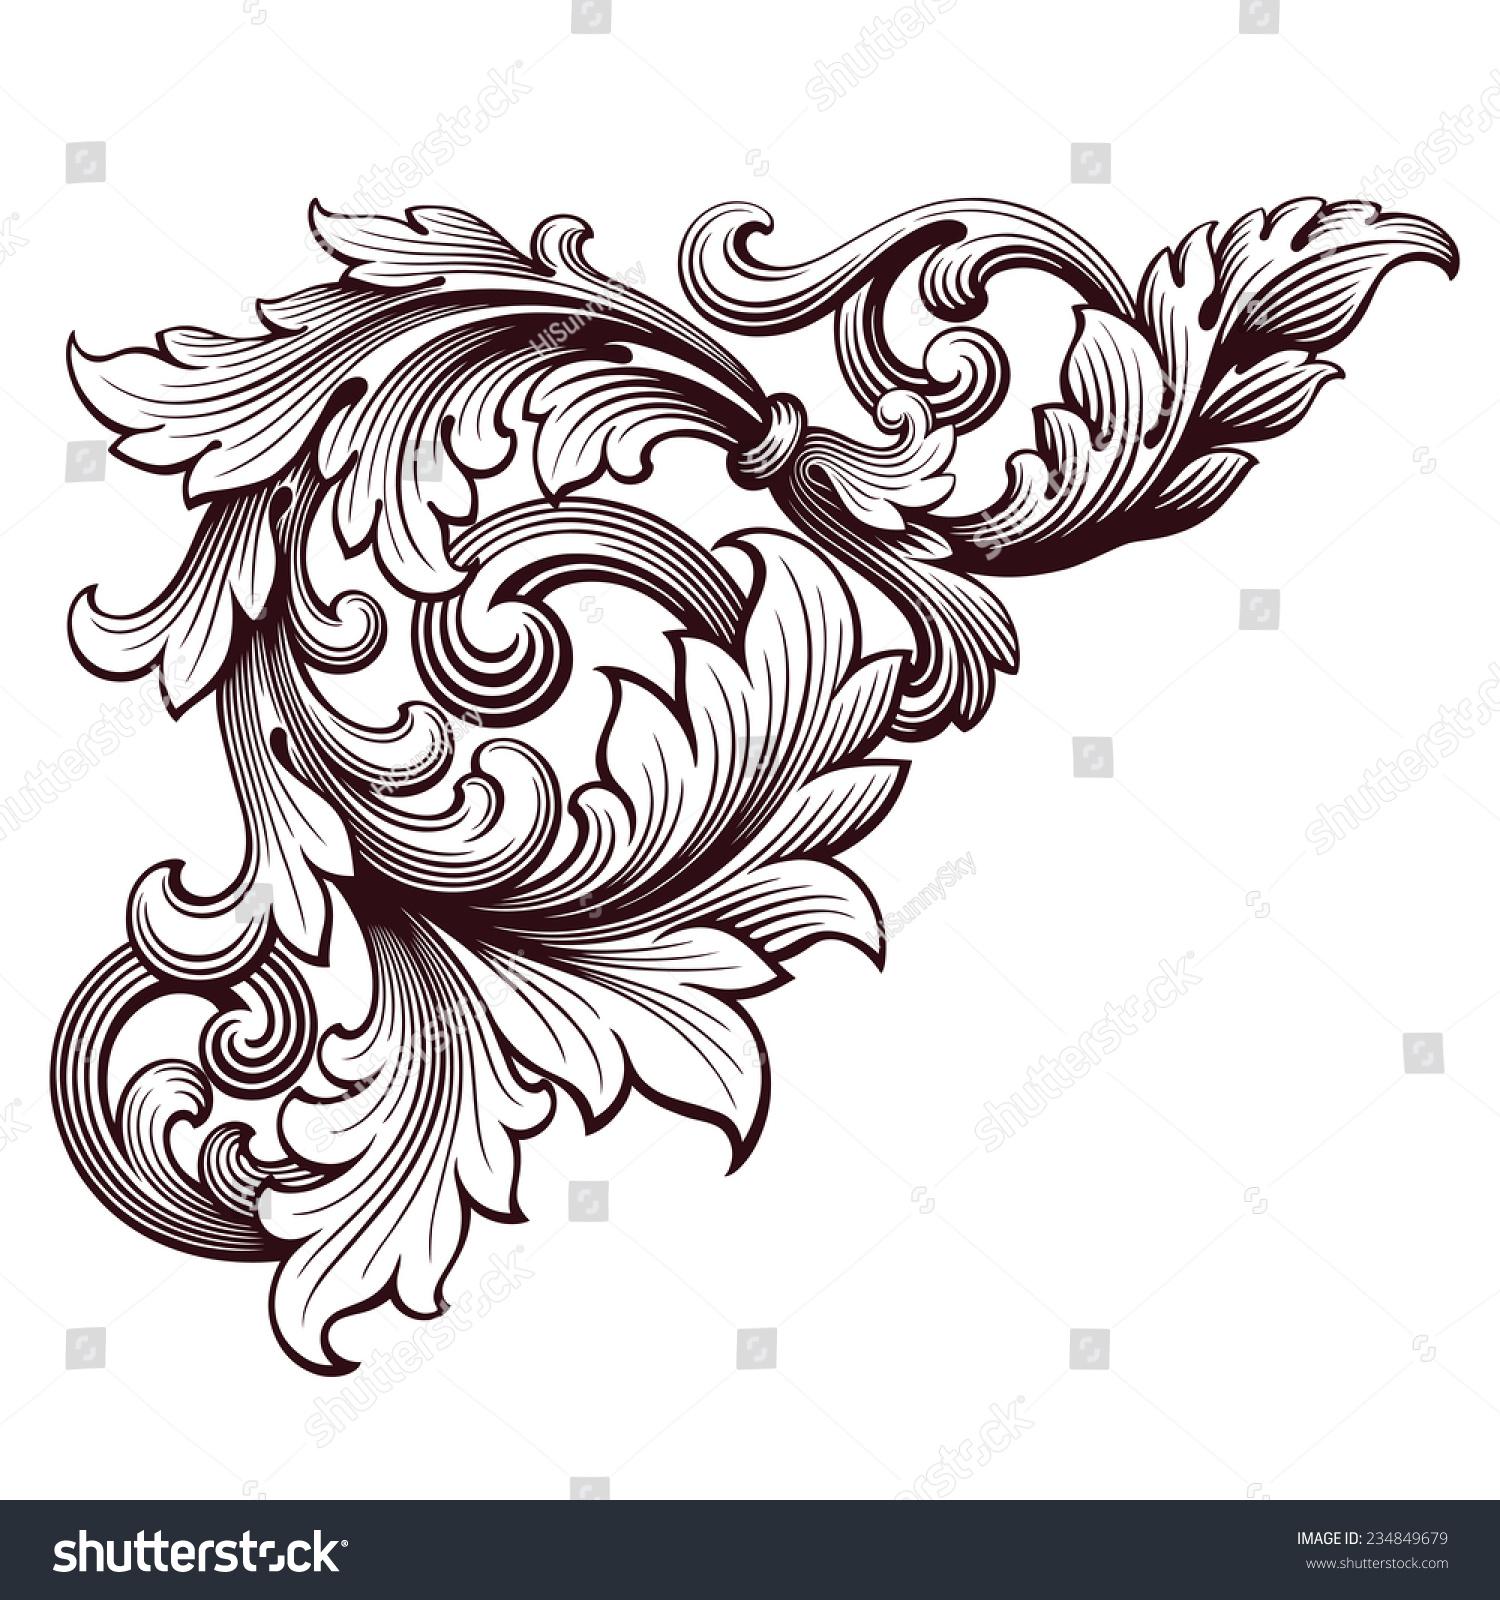 vintage baroque scroll design frame corner pattern element engraving retro style ornament